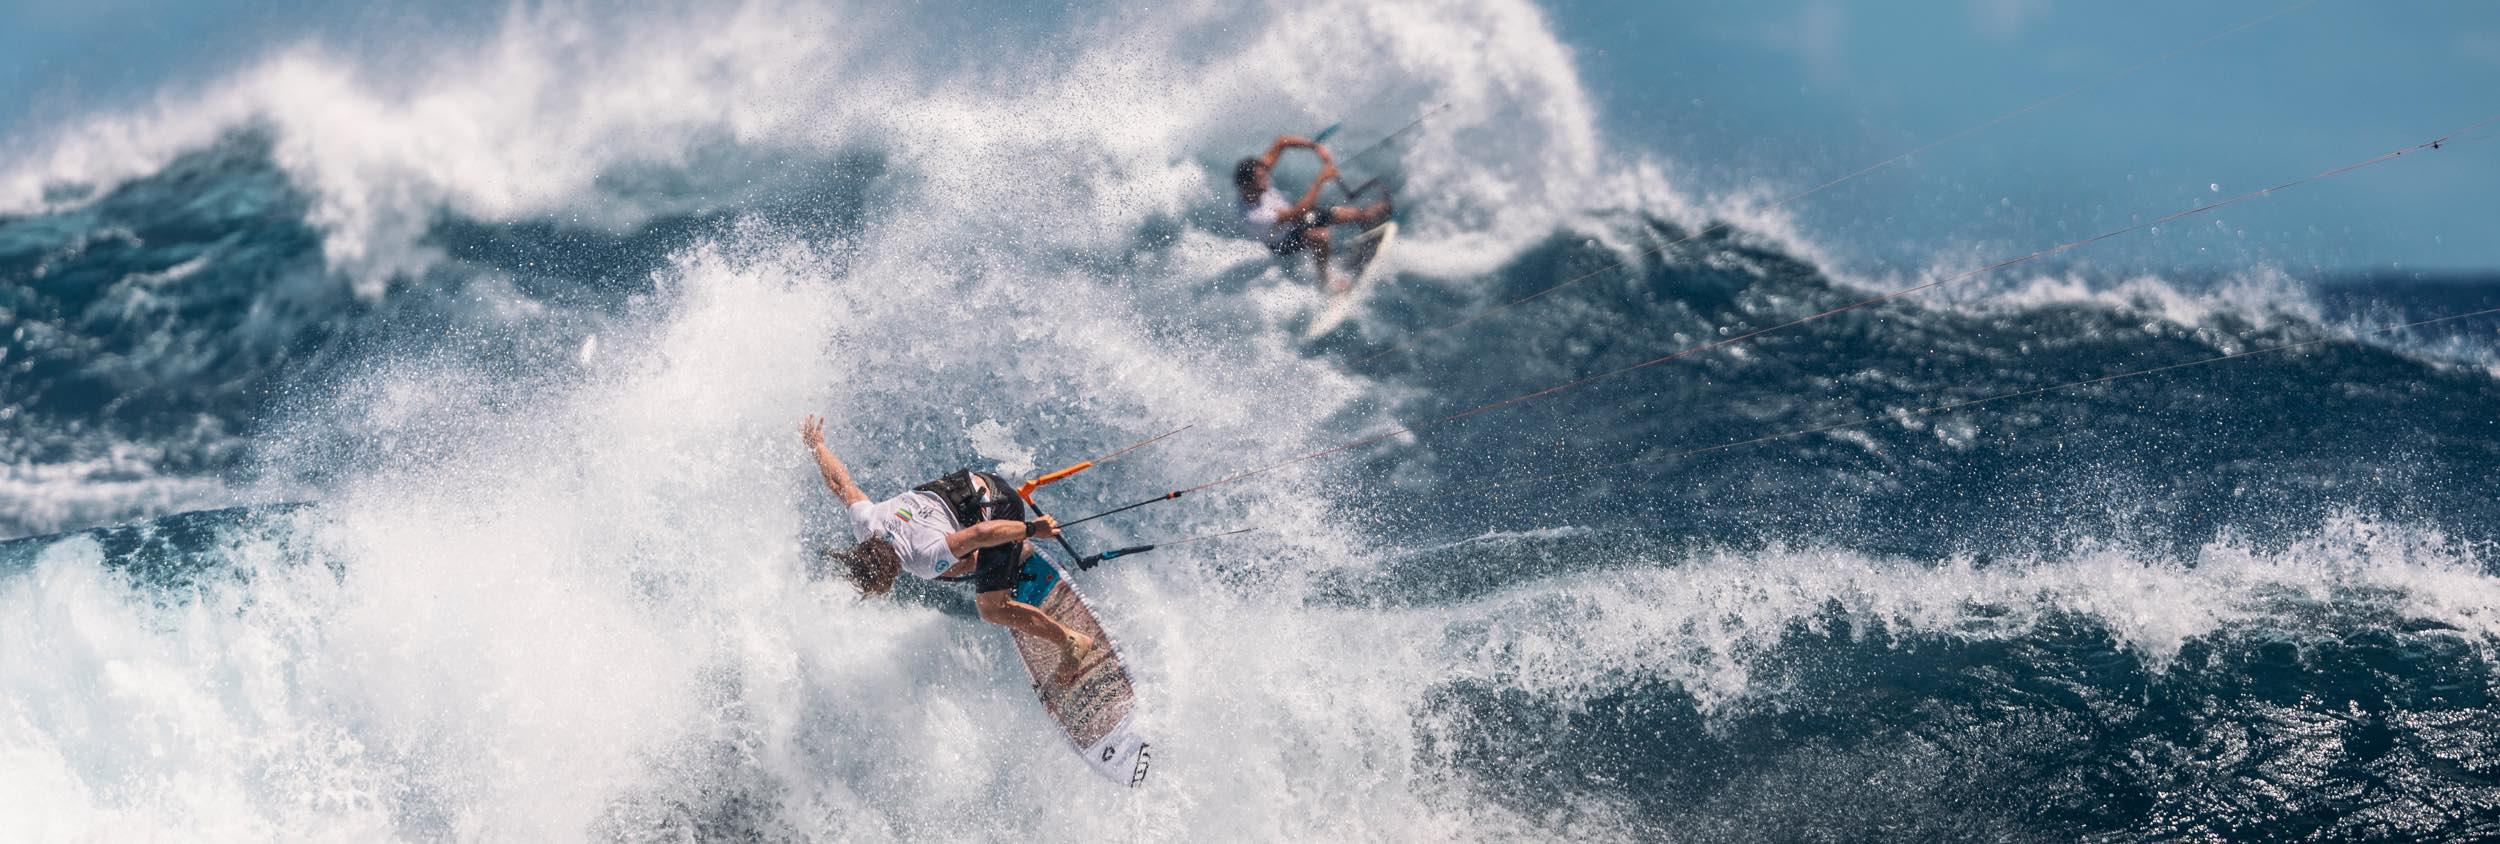 GKA Mauritius epic waves